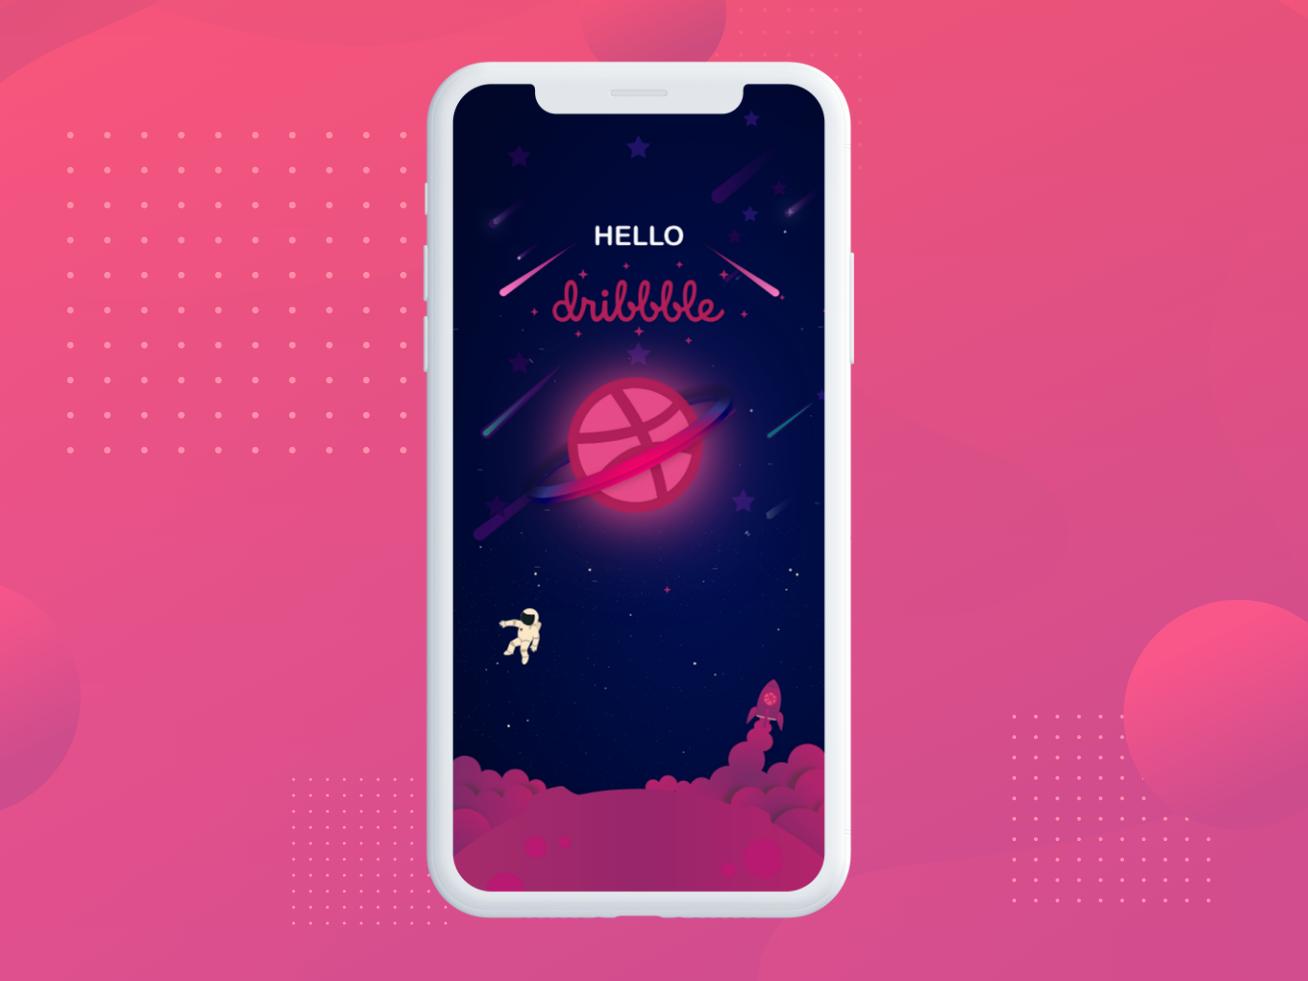 Dribbble dribbble hello dribbble ui deisgn app design